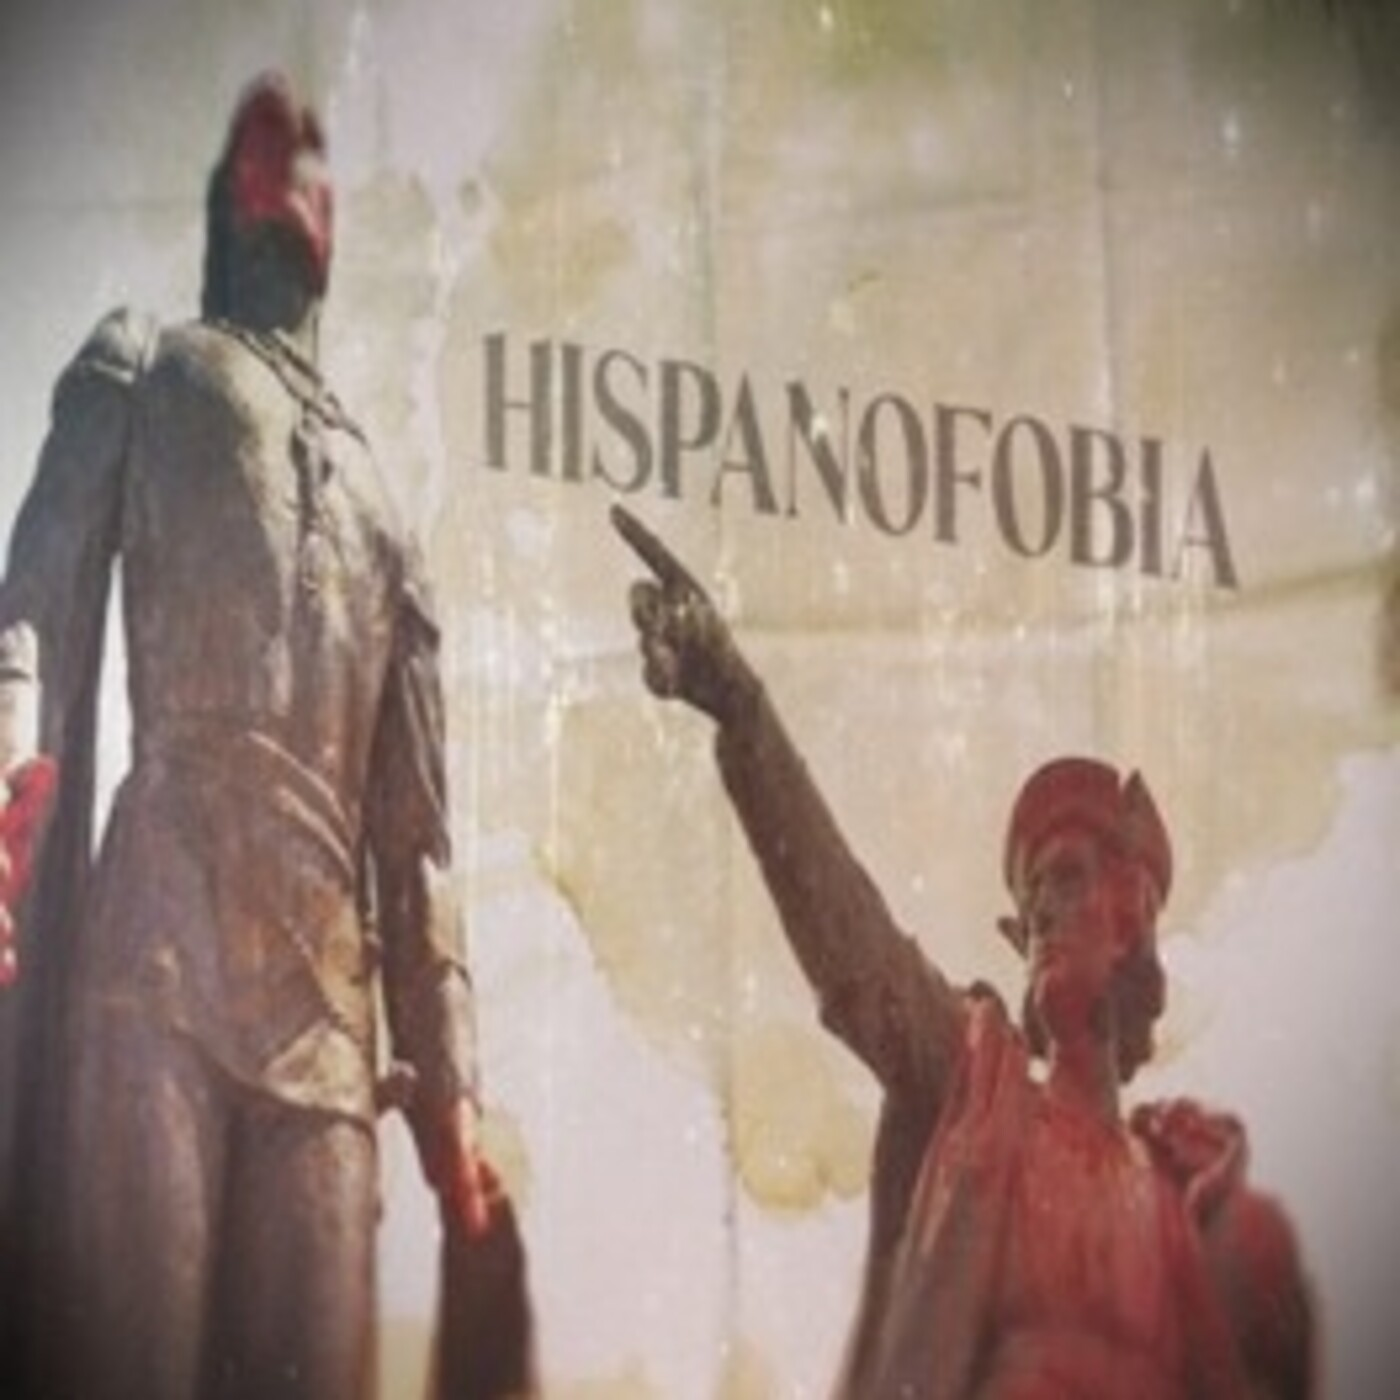 Cuarto milenio (18/10/2020) 15x33: Hispanofobia